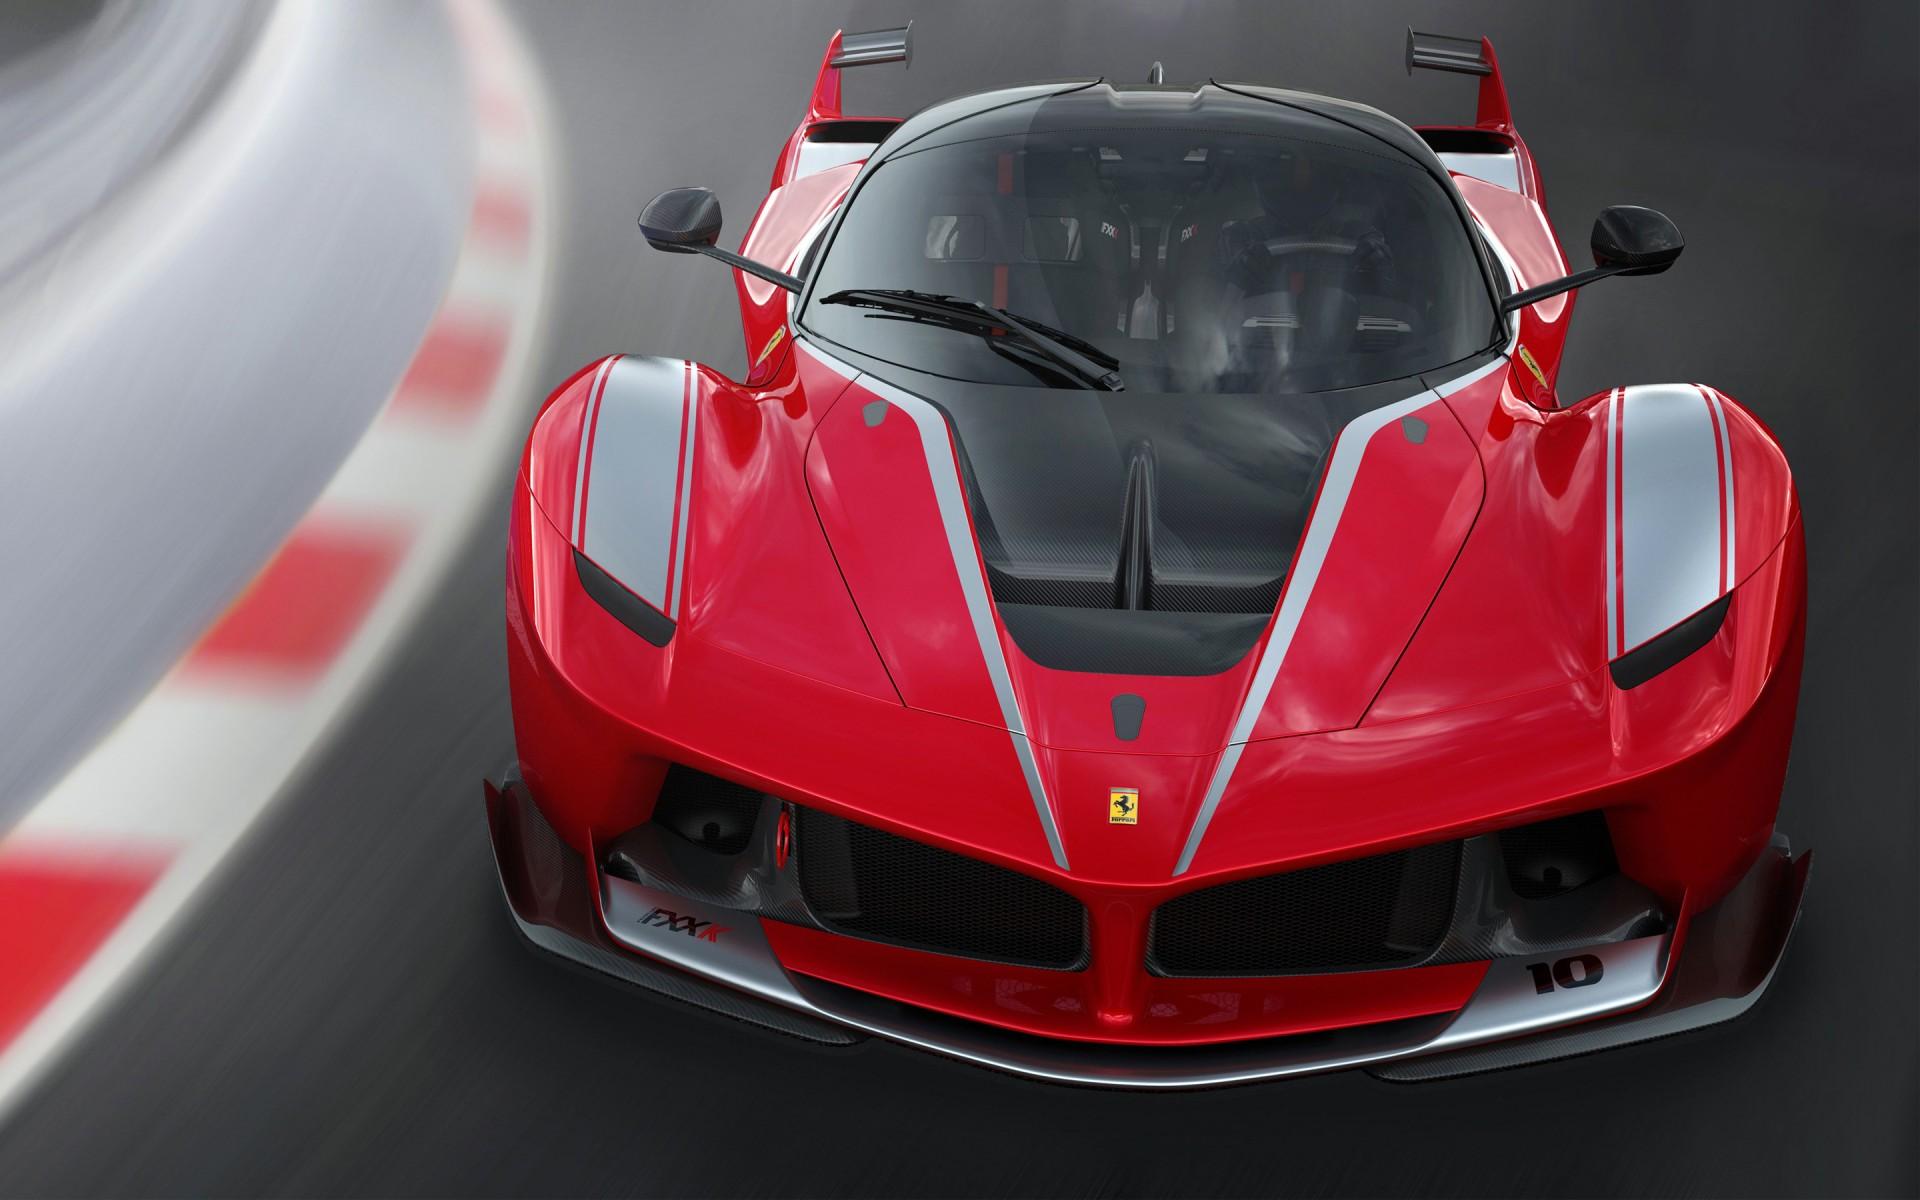 Картинки Ferrari, 2016, FXX фото и обои на рабочий стол